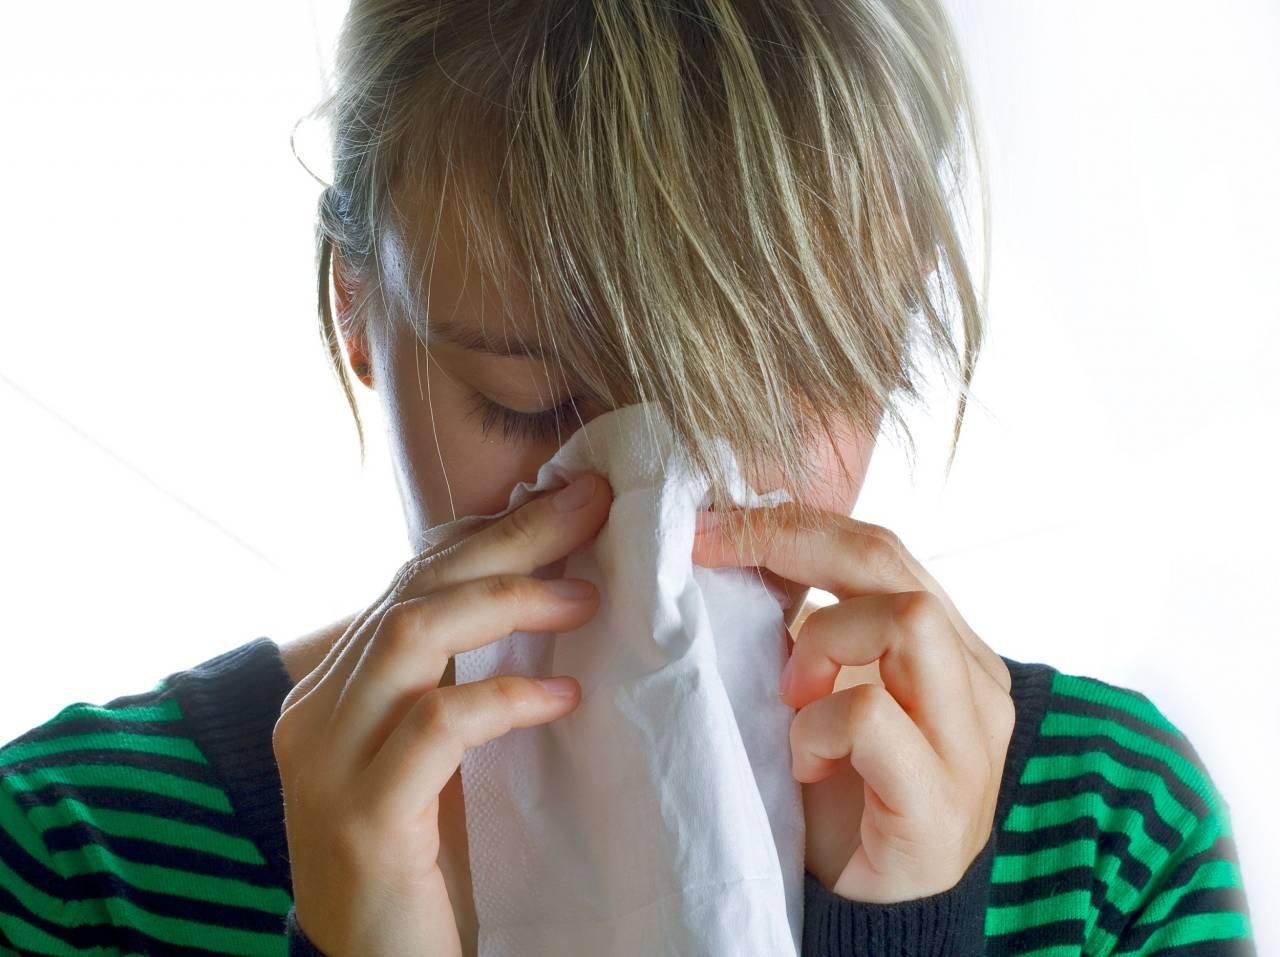 Drug-resistant superbug wreaks havoc in the US